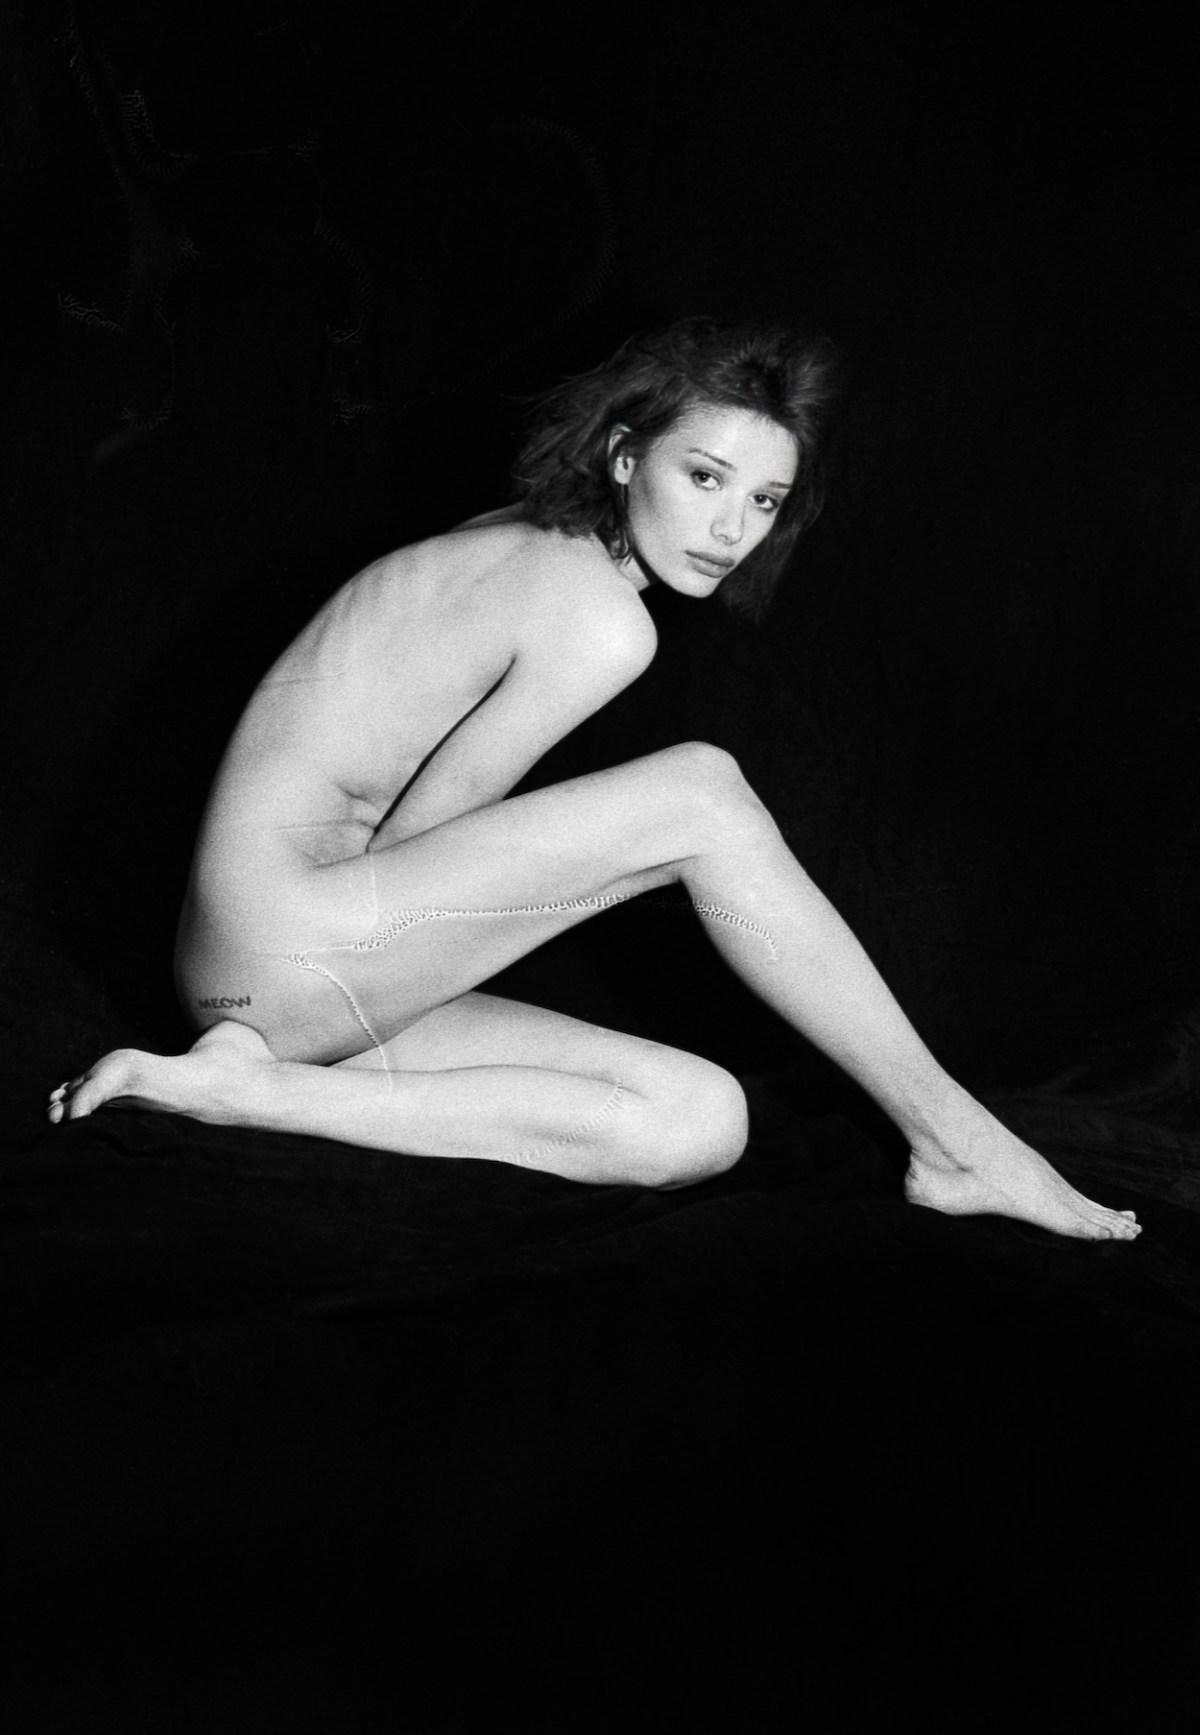 Renata Gubaeva by Nick Tsirogiannidis